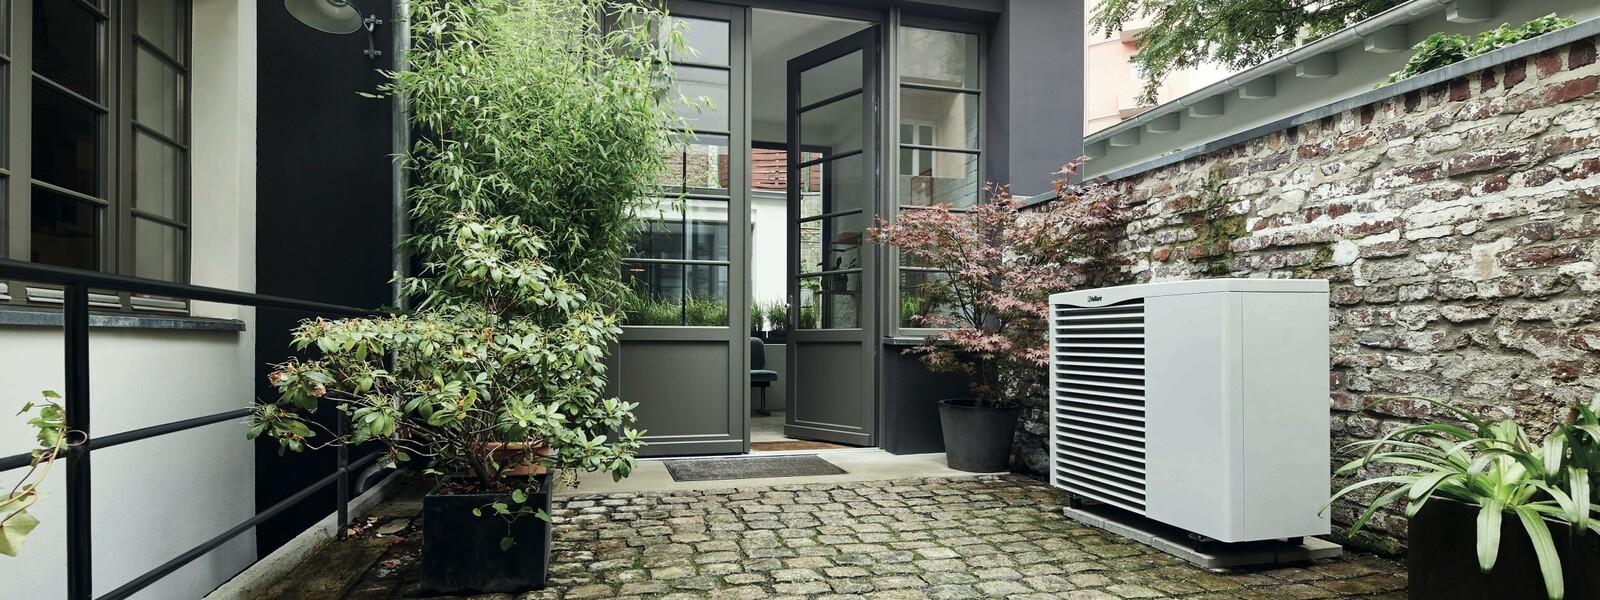 https://www.vaillant.fr/images-1/produits/pac/arotherm/arotherm-ambiance-1297902-format-24-9@1600@desktop.jpg